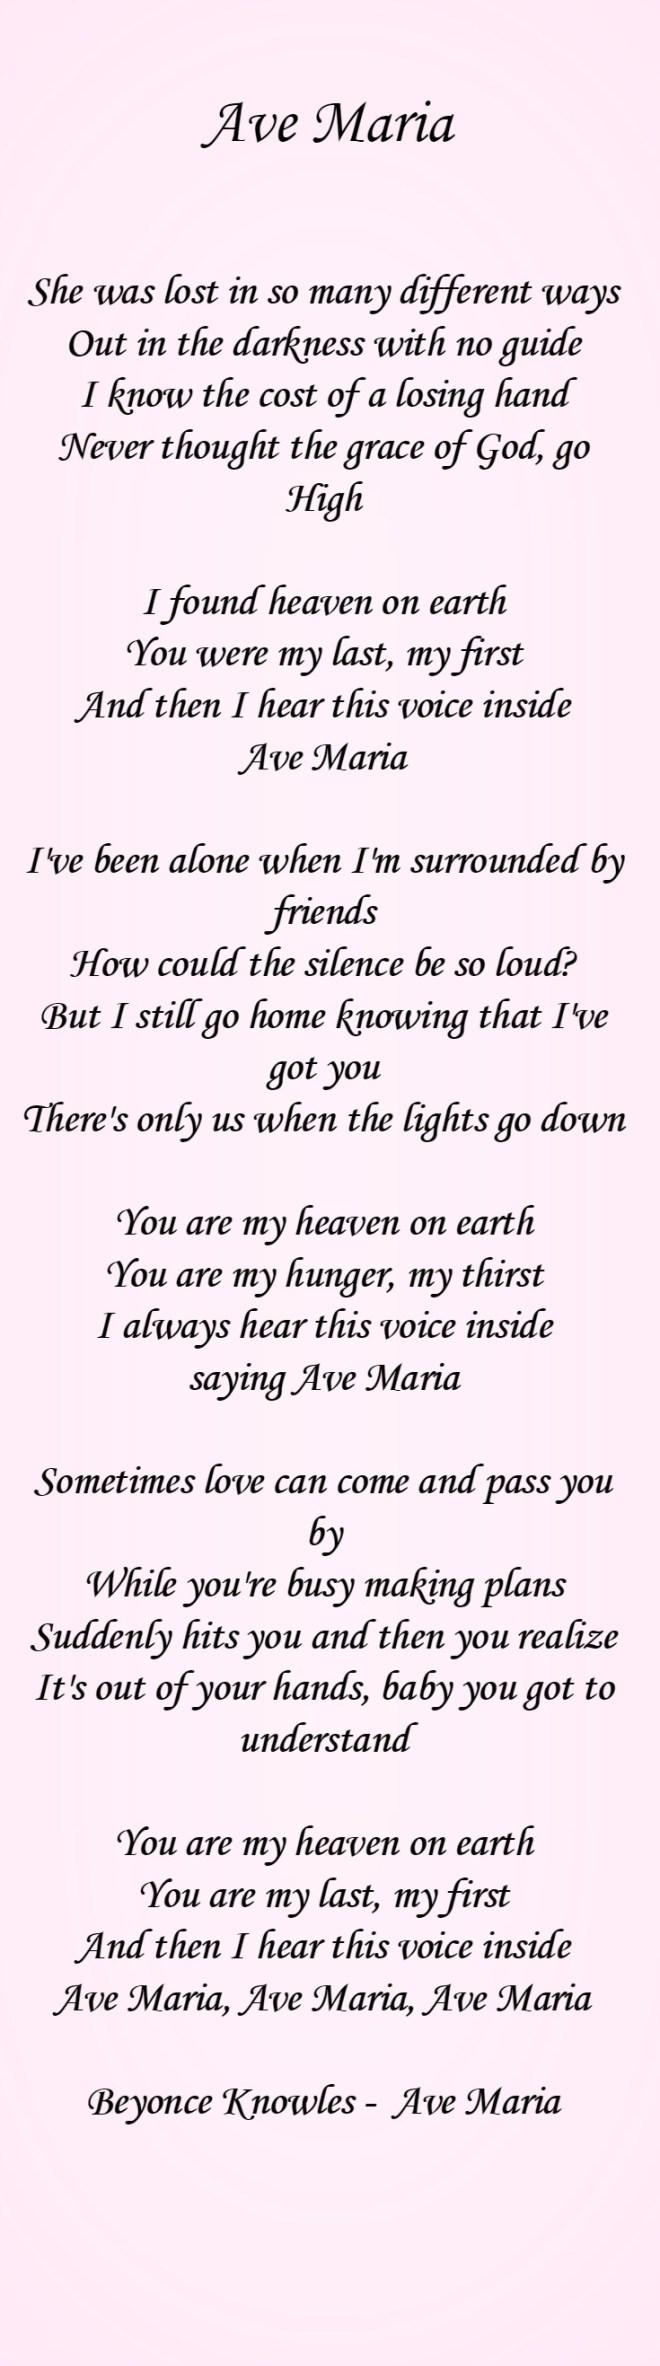 Ave maria lyrics for pinterest for House music lyrics